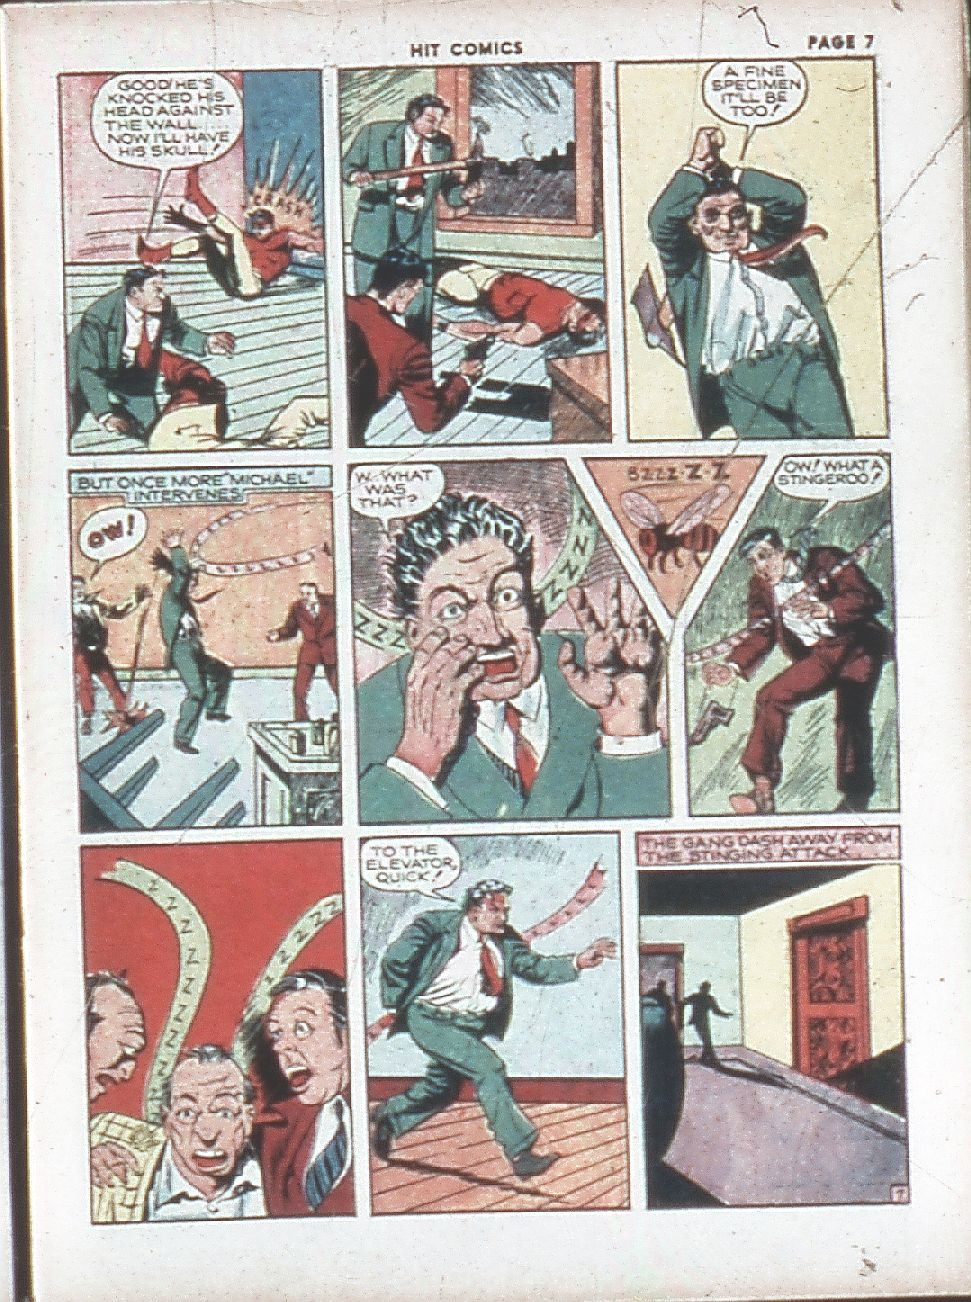 Read online Hit Comics comic -  Issue #7 - 9